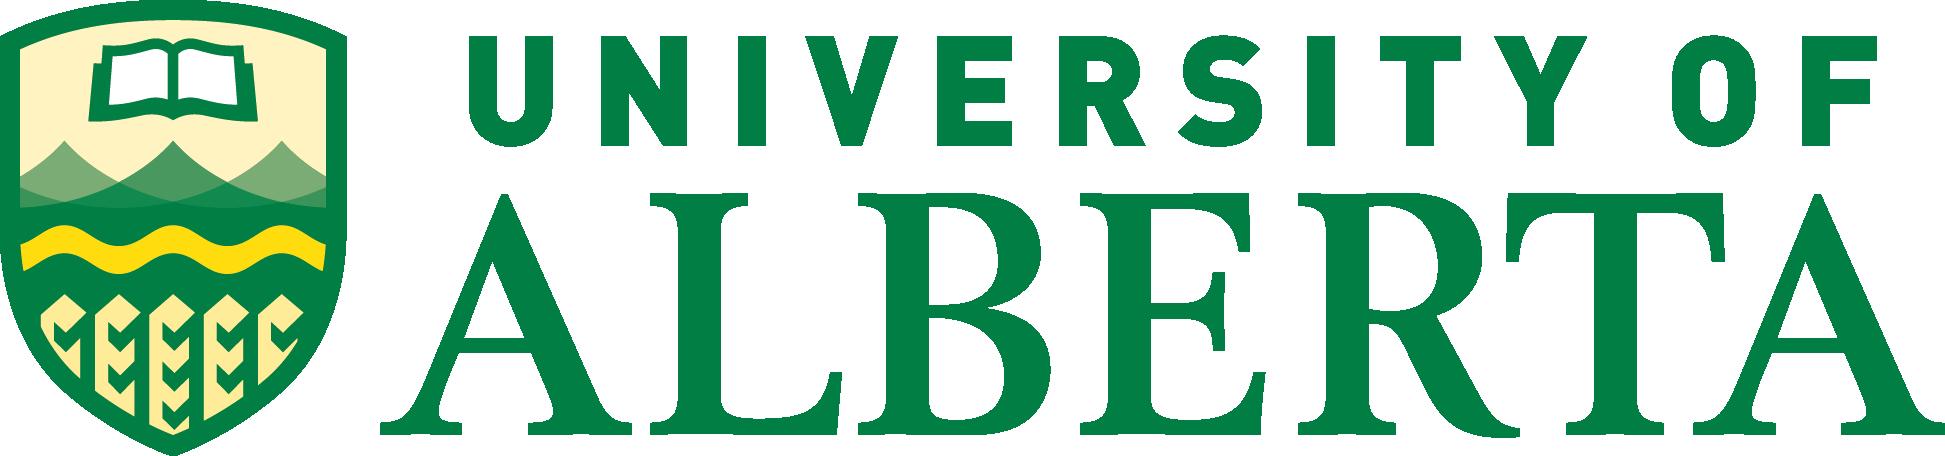 Uofl Academic Calendar 2022.University Of Alberta Acalog Acms